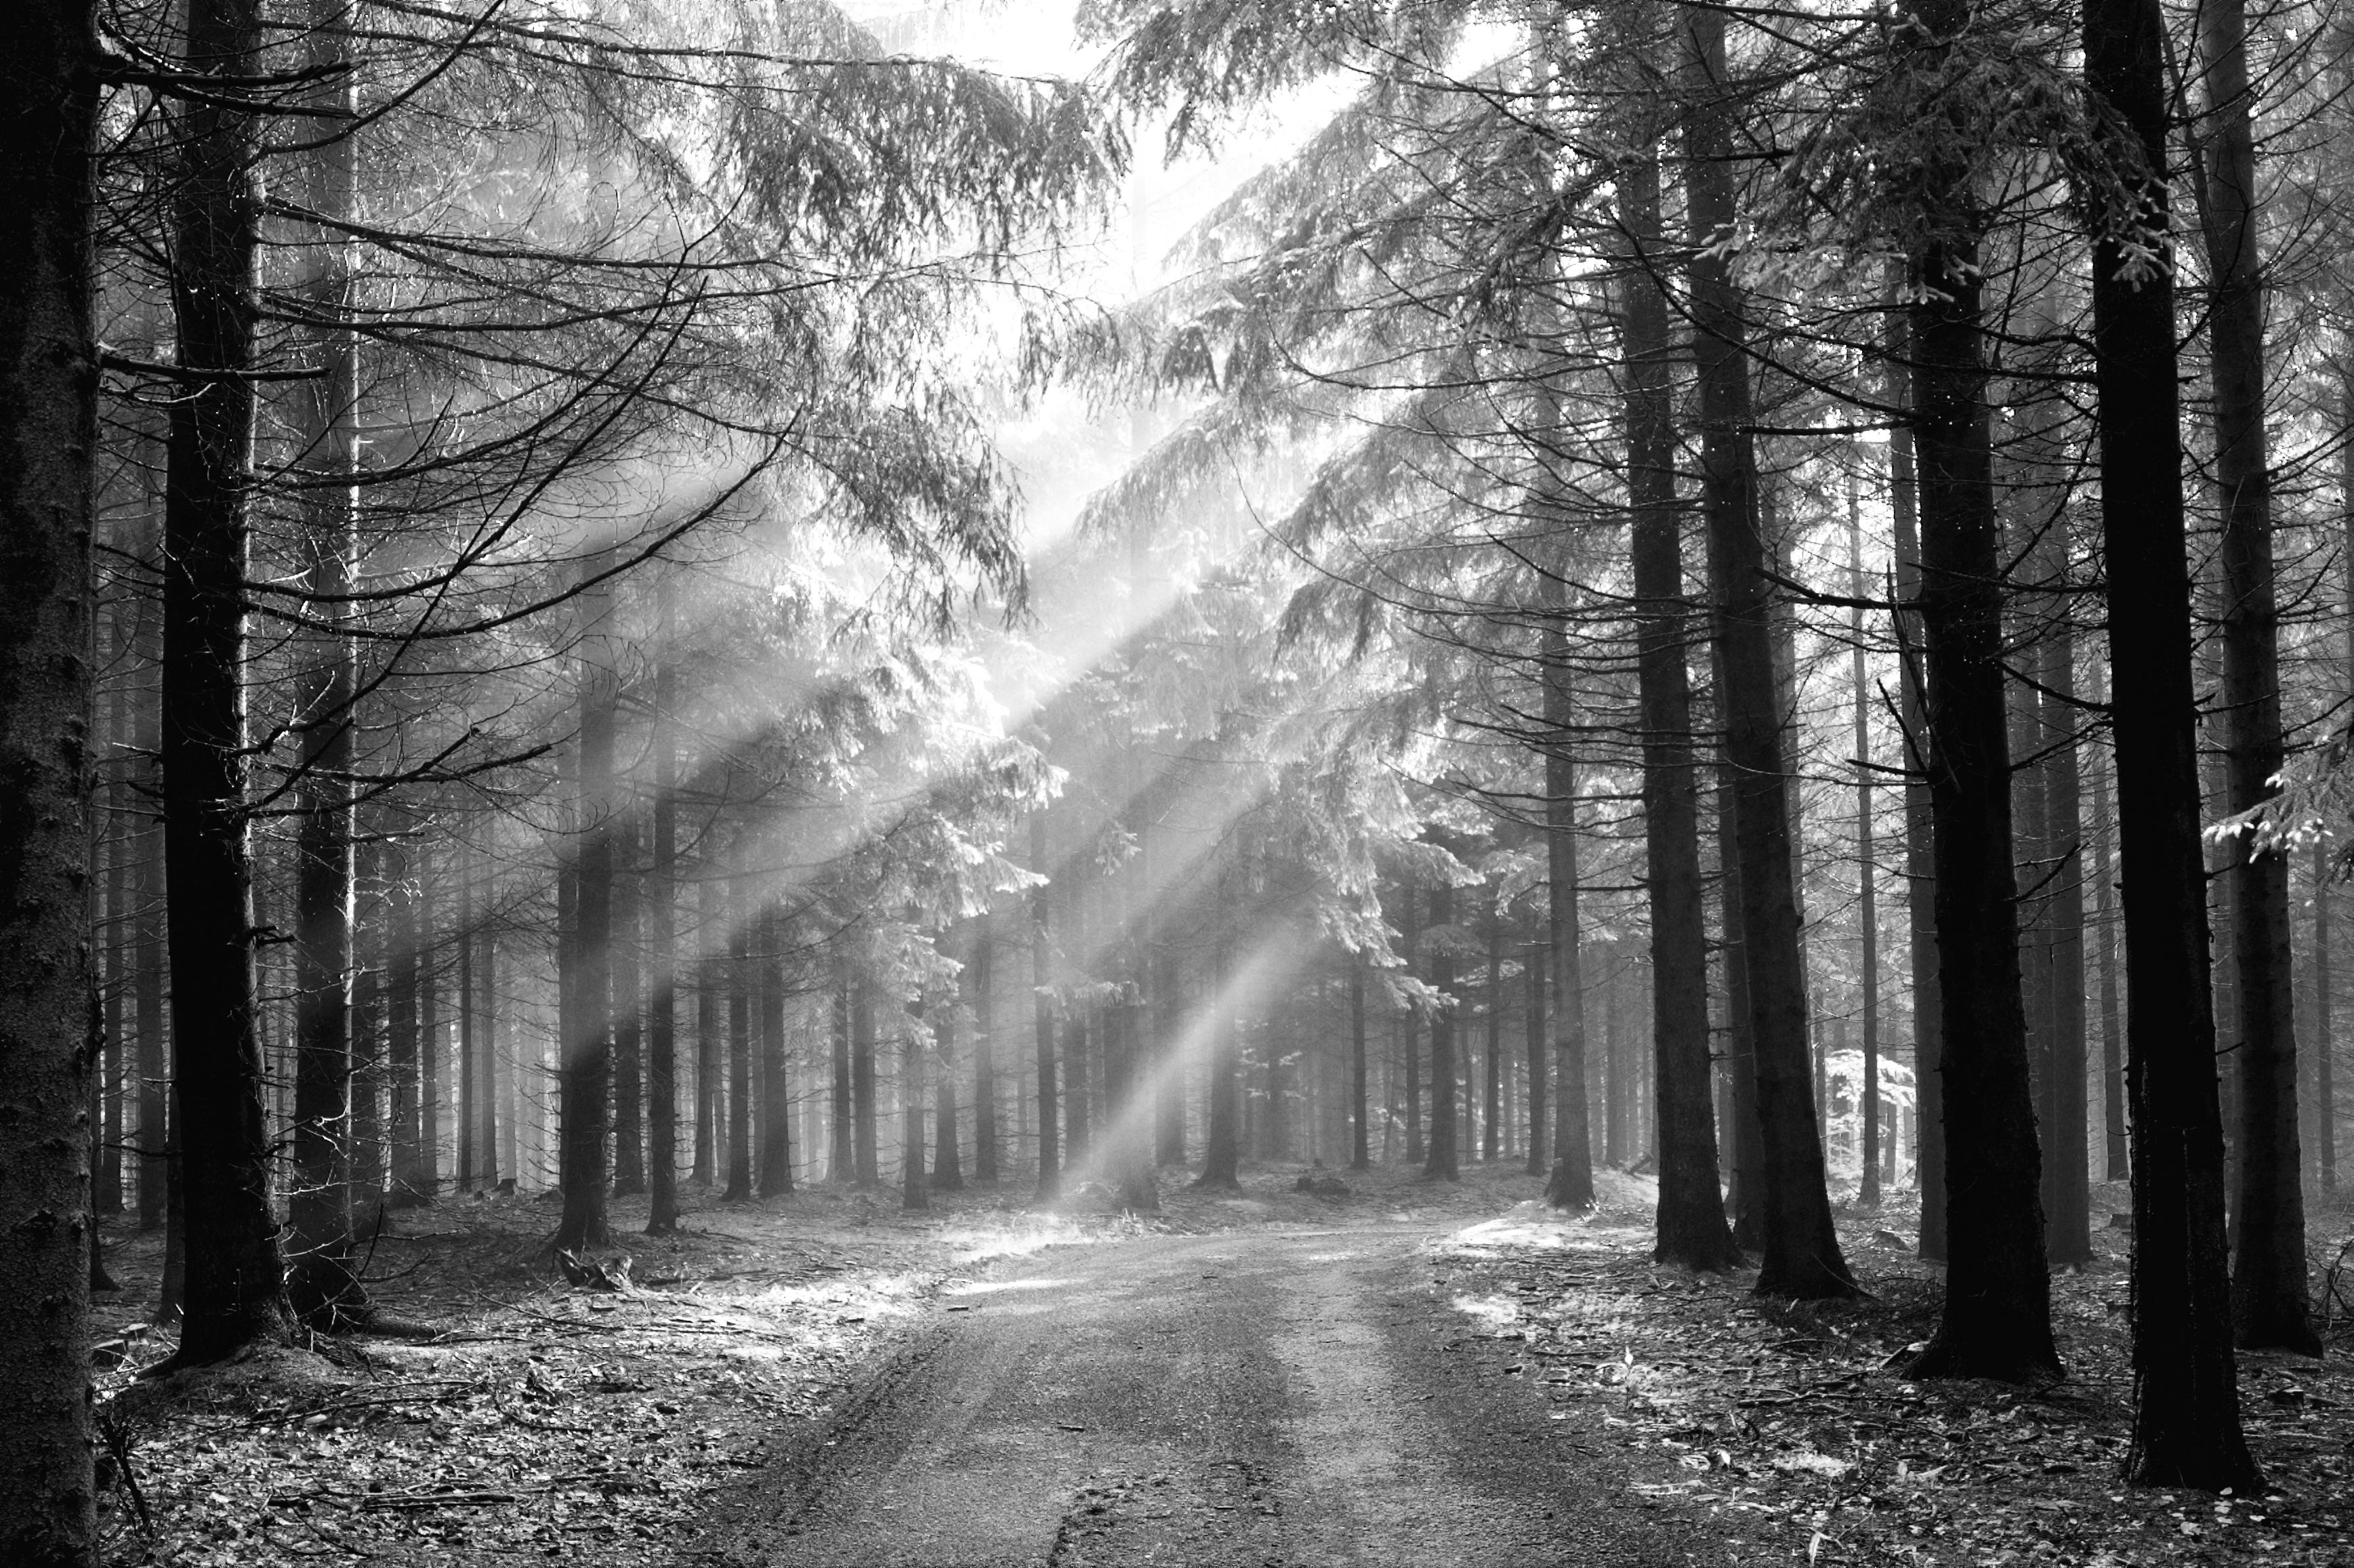 black and white forest images - media file   pixelstalk